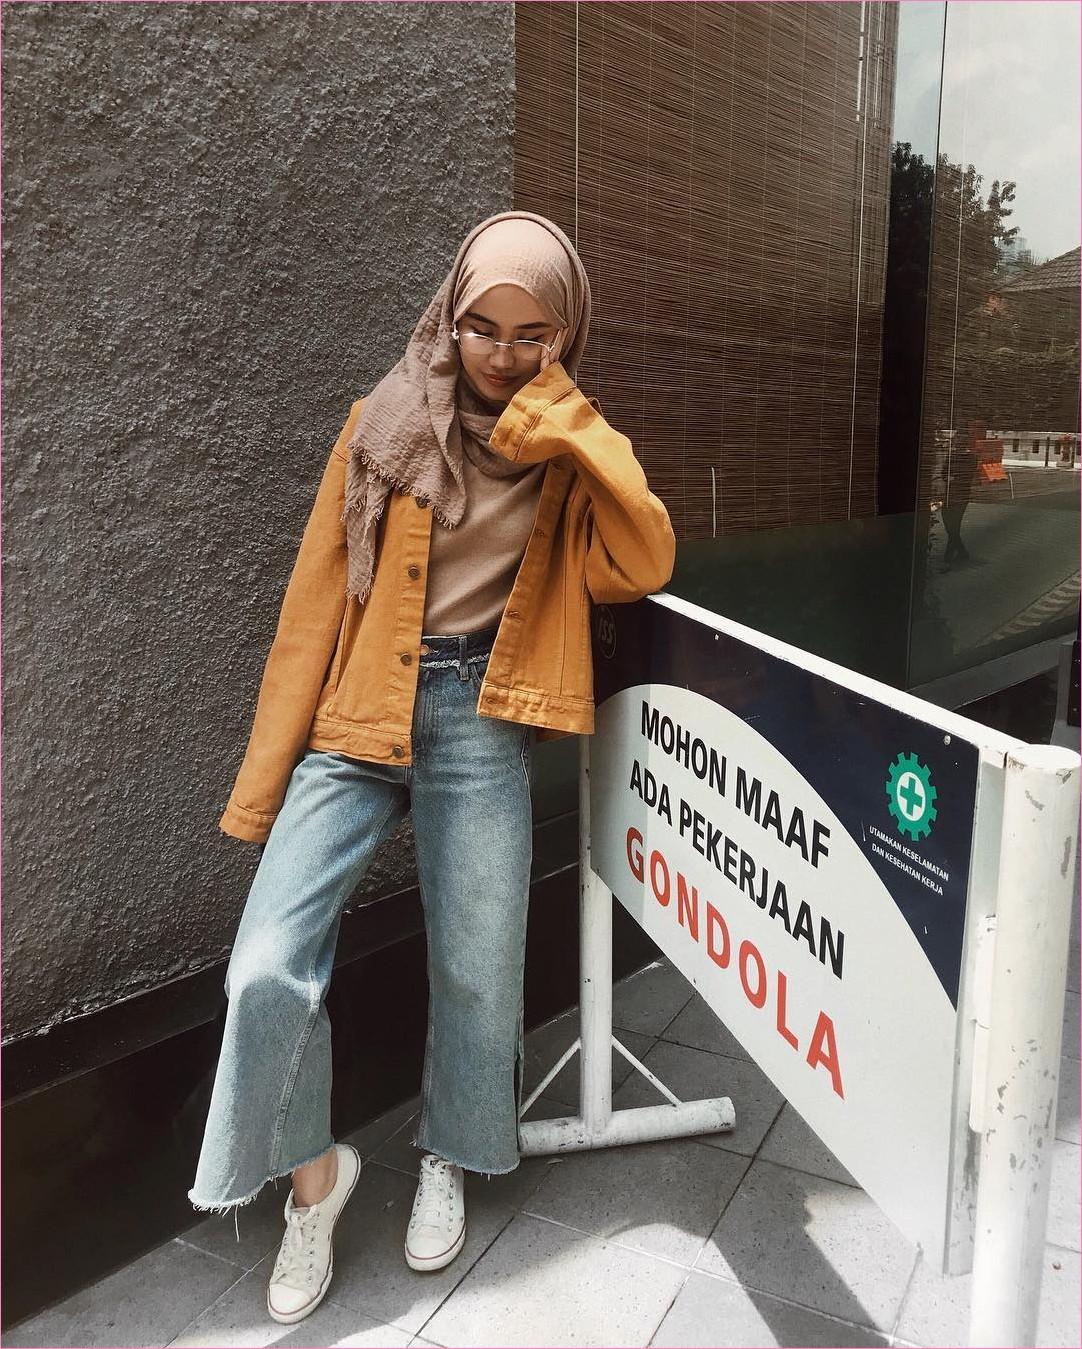 Outfit Kerudung Pashmina Ala Selebgram 2018 hijab pashmina rawis krem jaket oren mangset t-shirt celana jeans denim kulot pallazo sepatu kets sneakers putih kacamta bulat ootd trendy kekinian hijabers tmii kaca tembok keramik